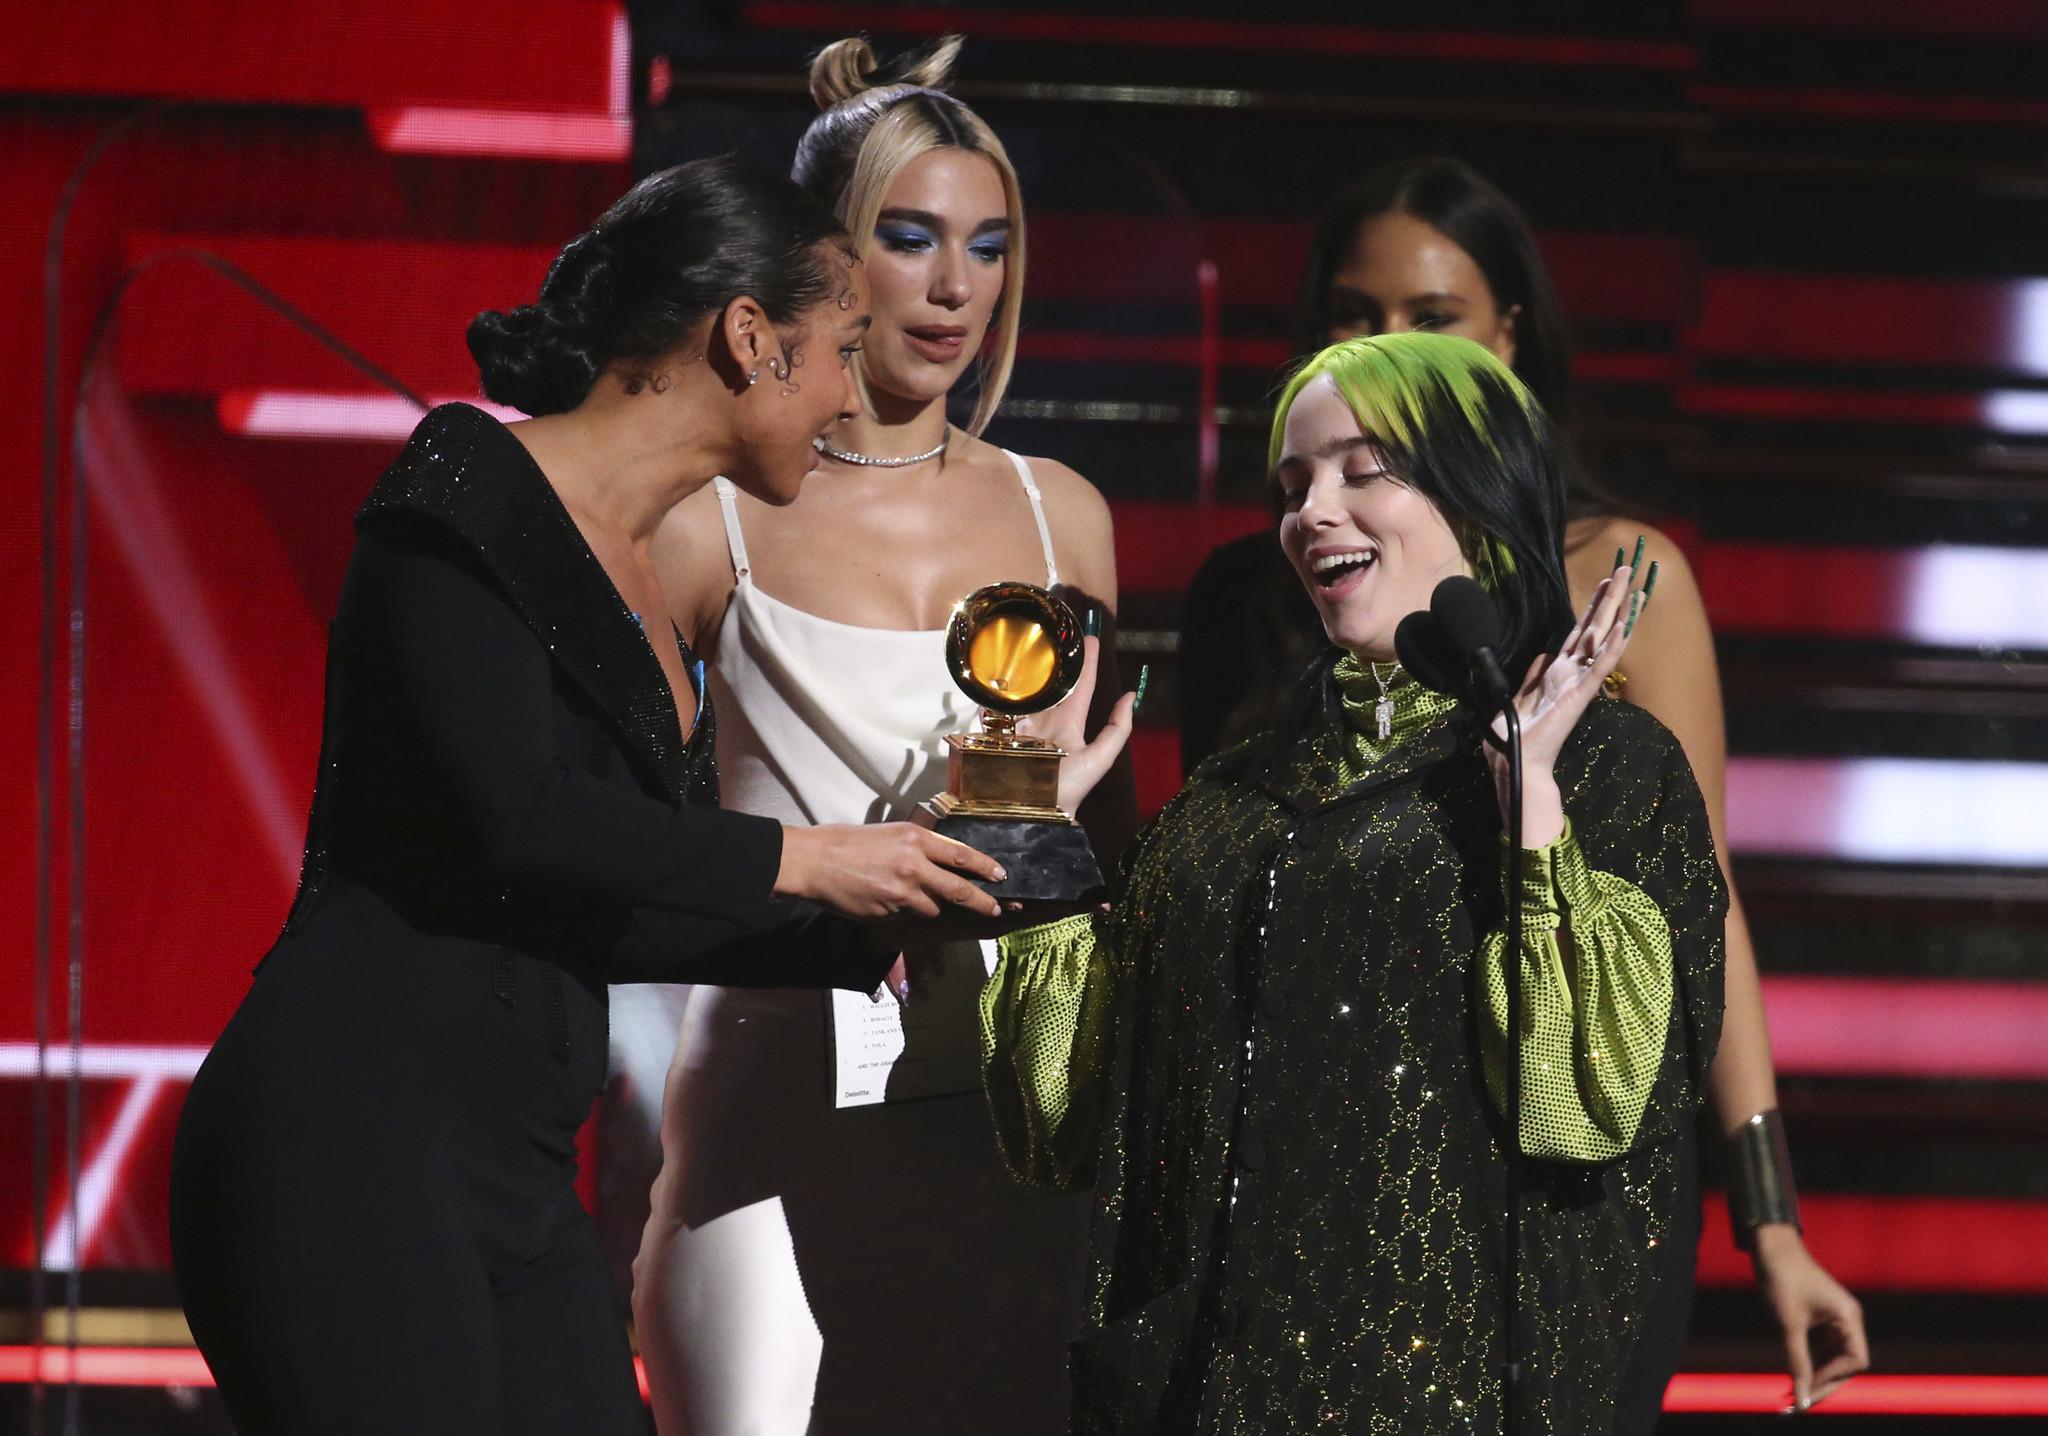 Billie Eilish wins top four awards at Grammys, including Best New Artist